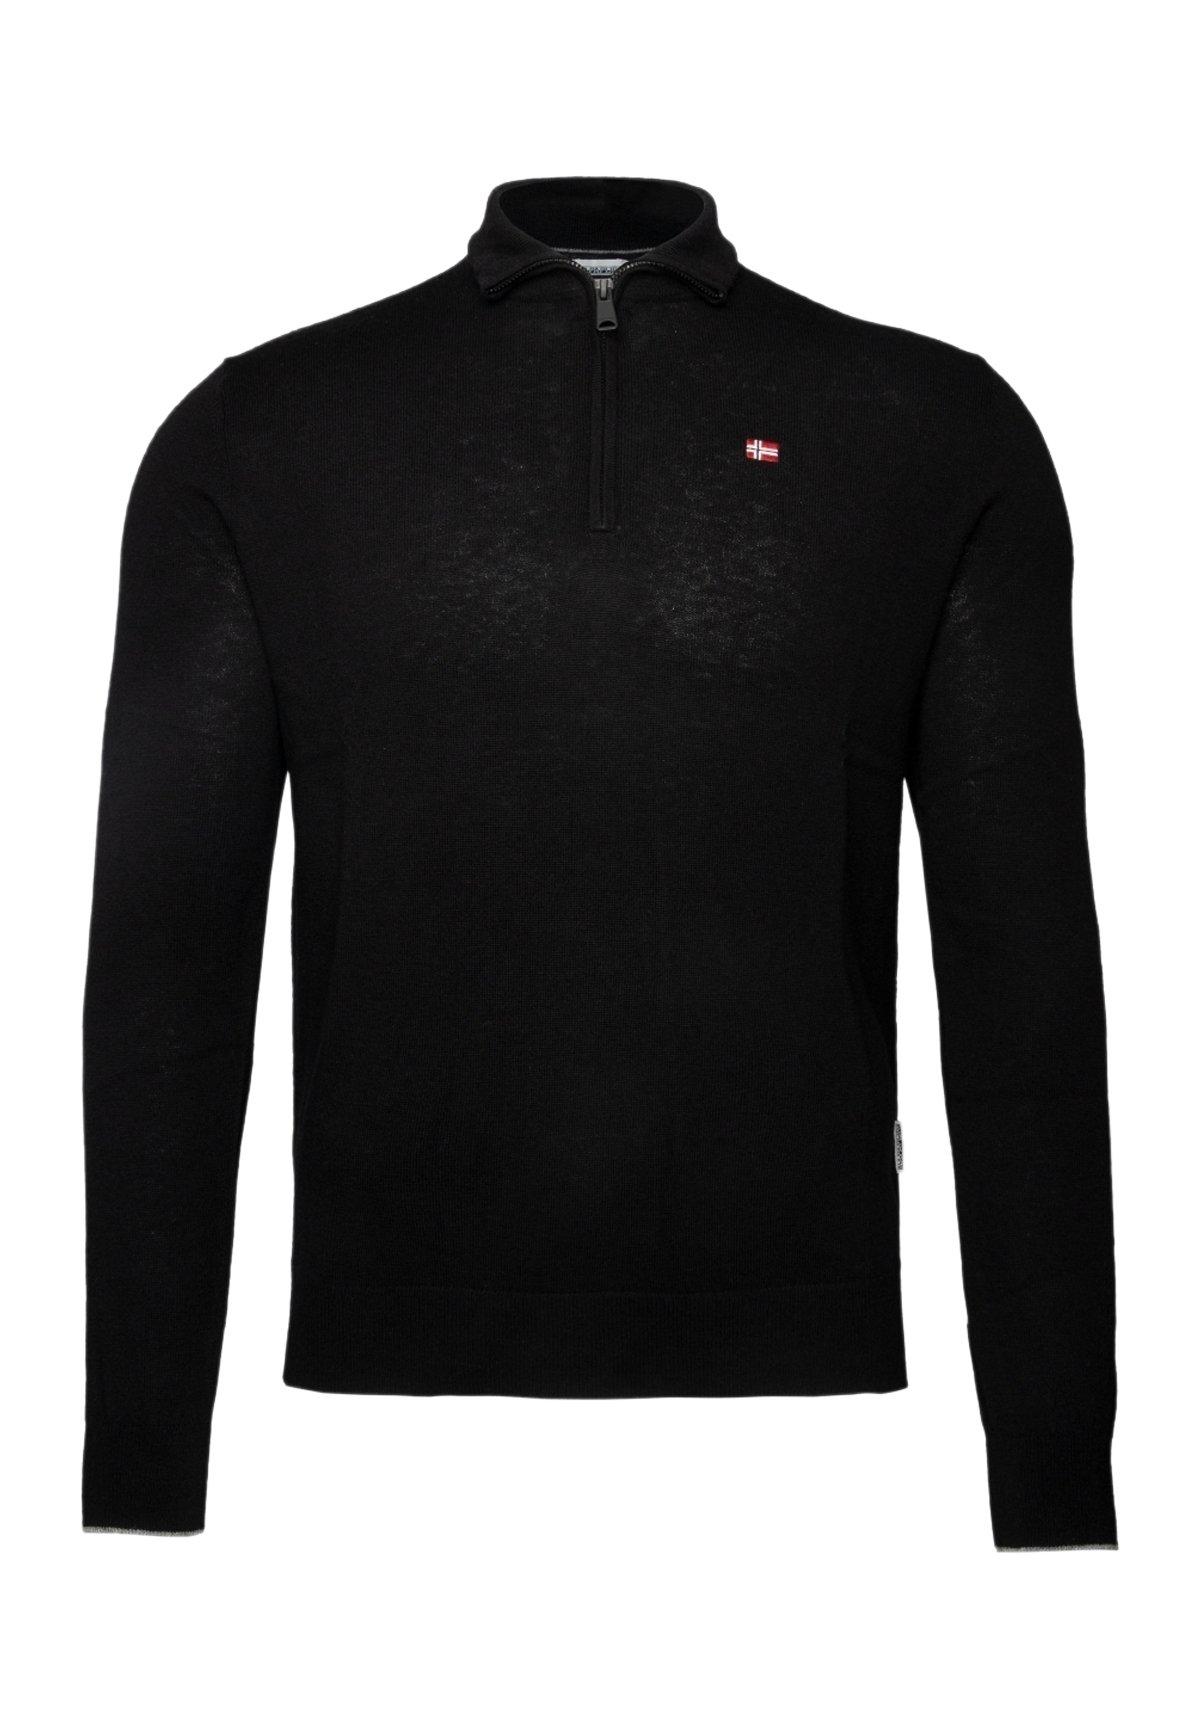 Homme DAMAVAND H 2 CREW NECK  - Pullover - black